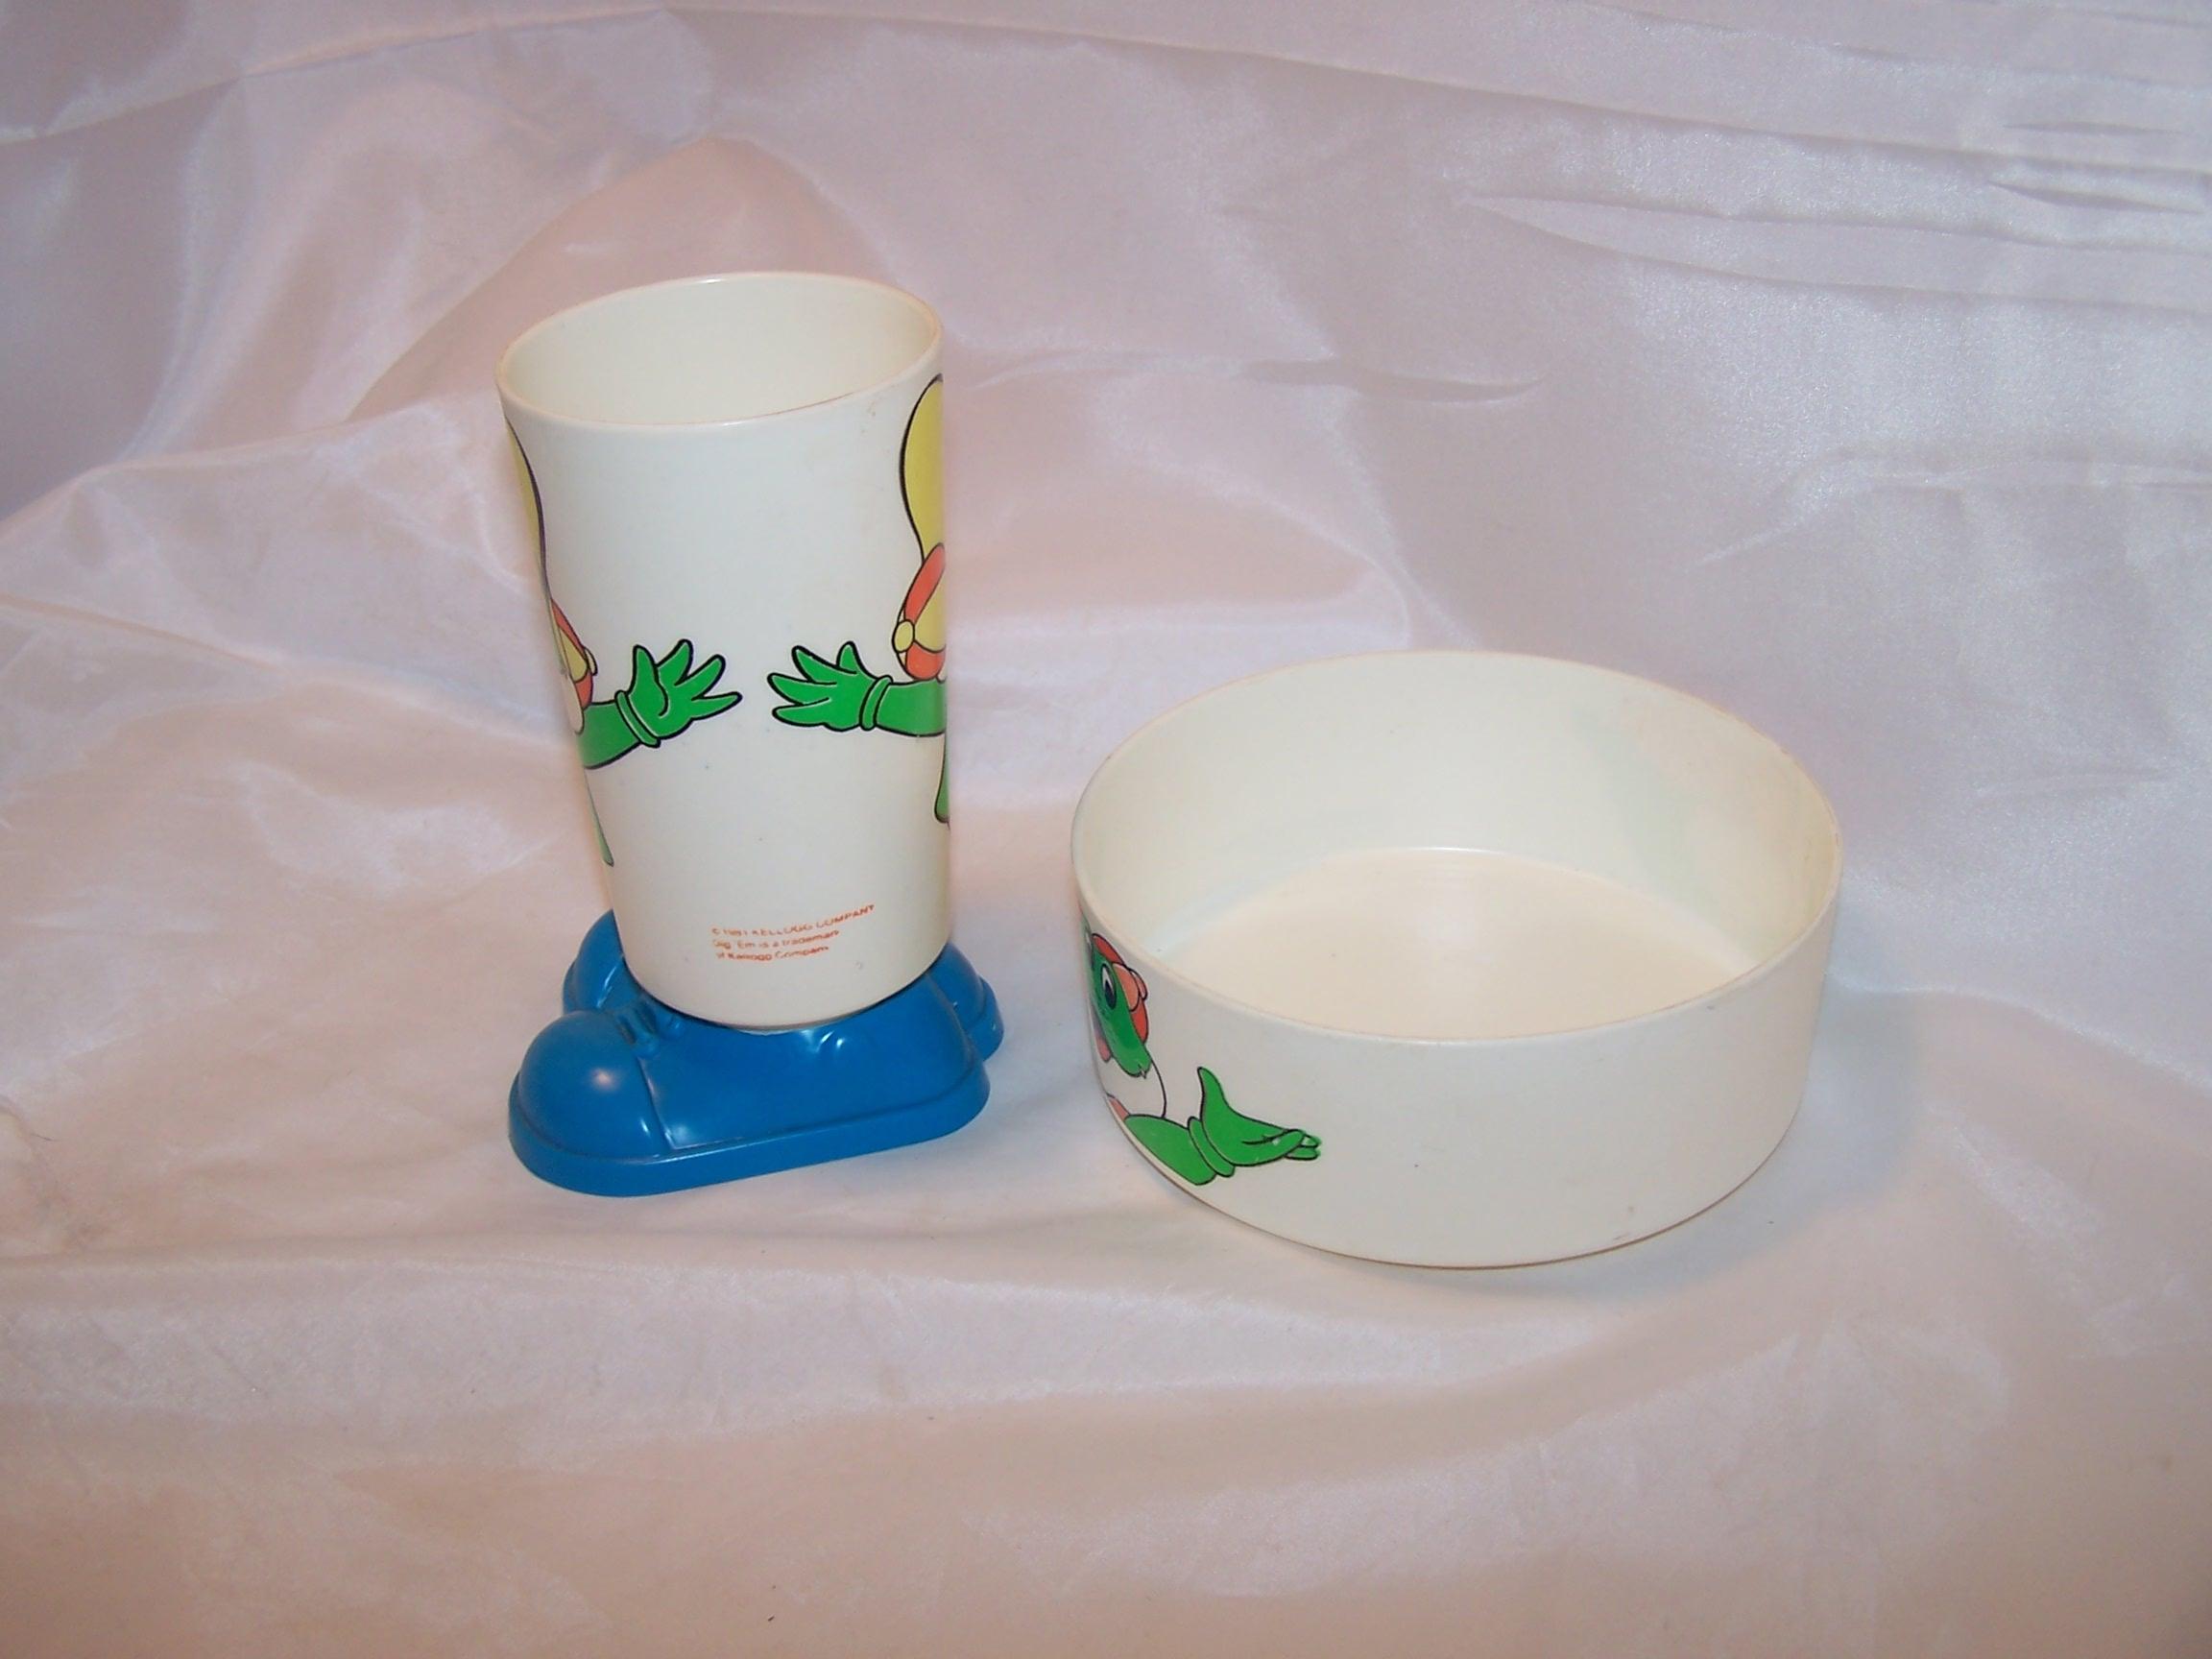 Image 1 of Kellogg Dig Em Cup and Bowl, Sugar Smacks, Plastic, 1980s